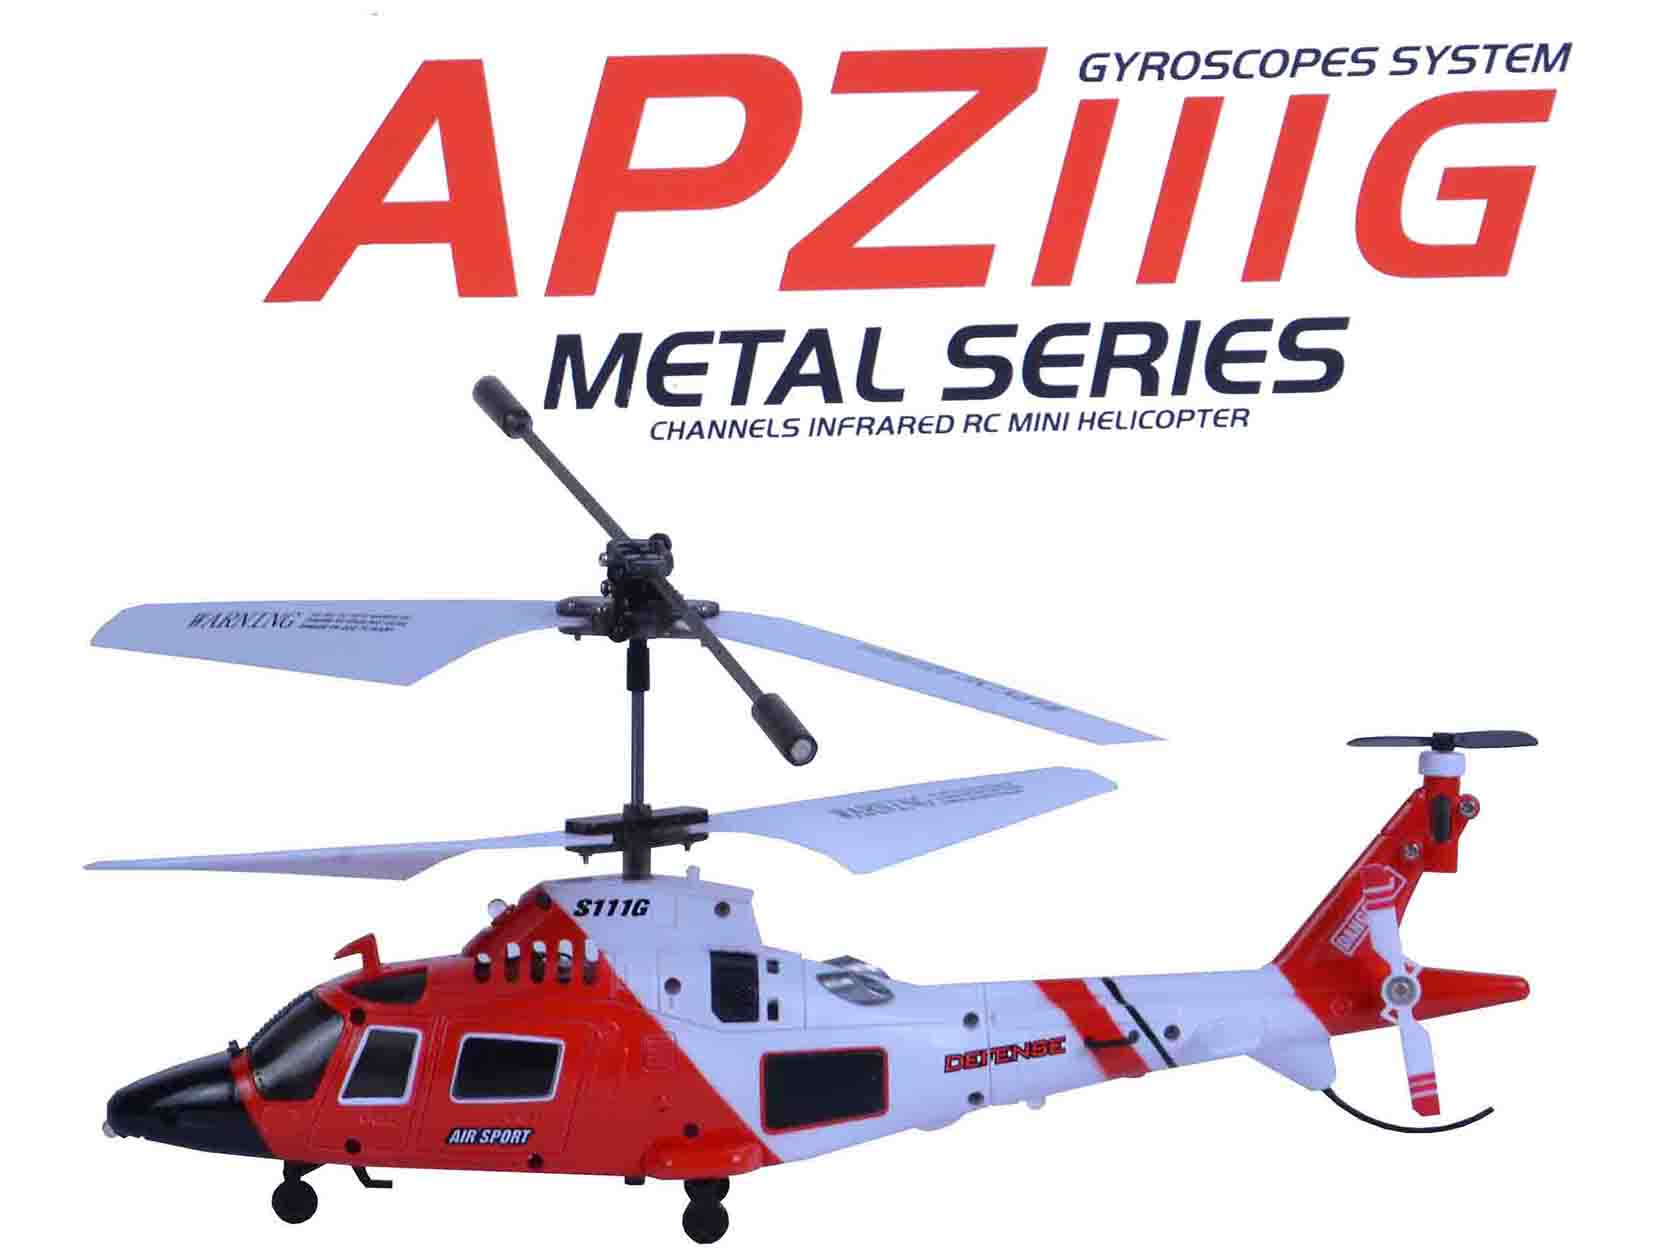 هلیکوپتر پروازی طرح اتش نشانی مدل اس 111 سایما